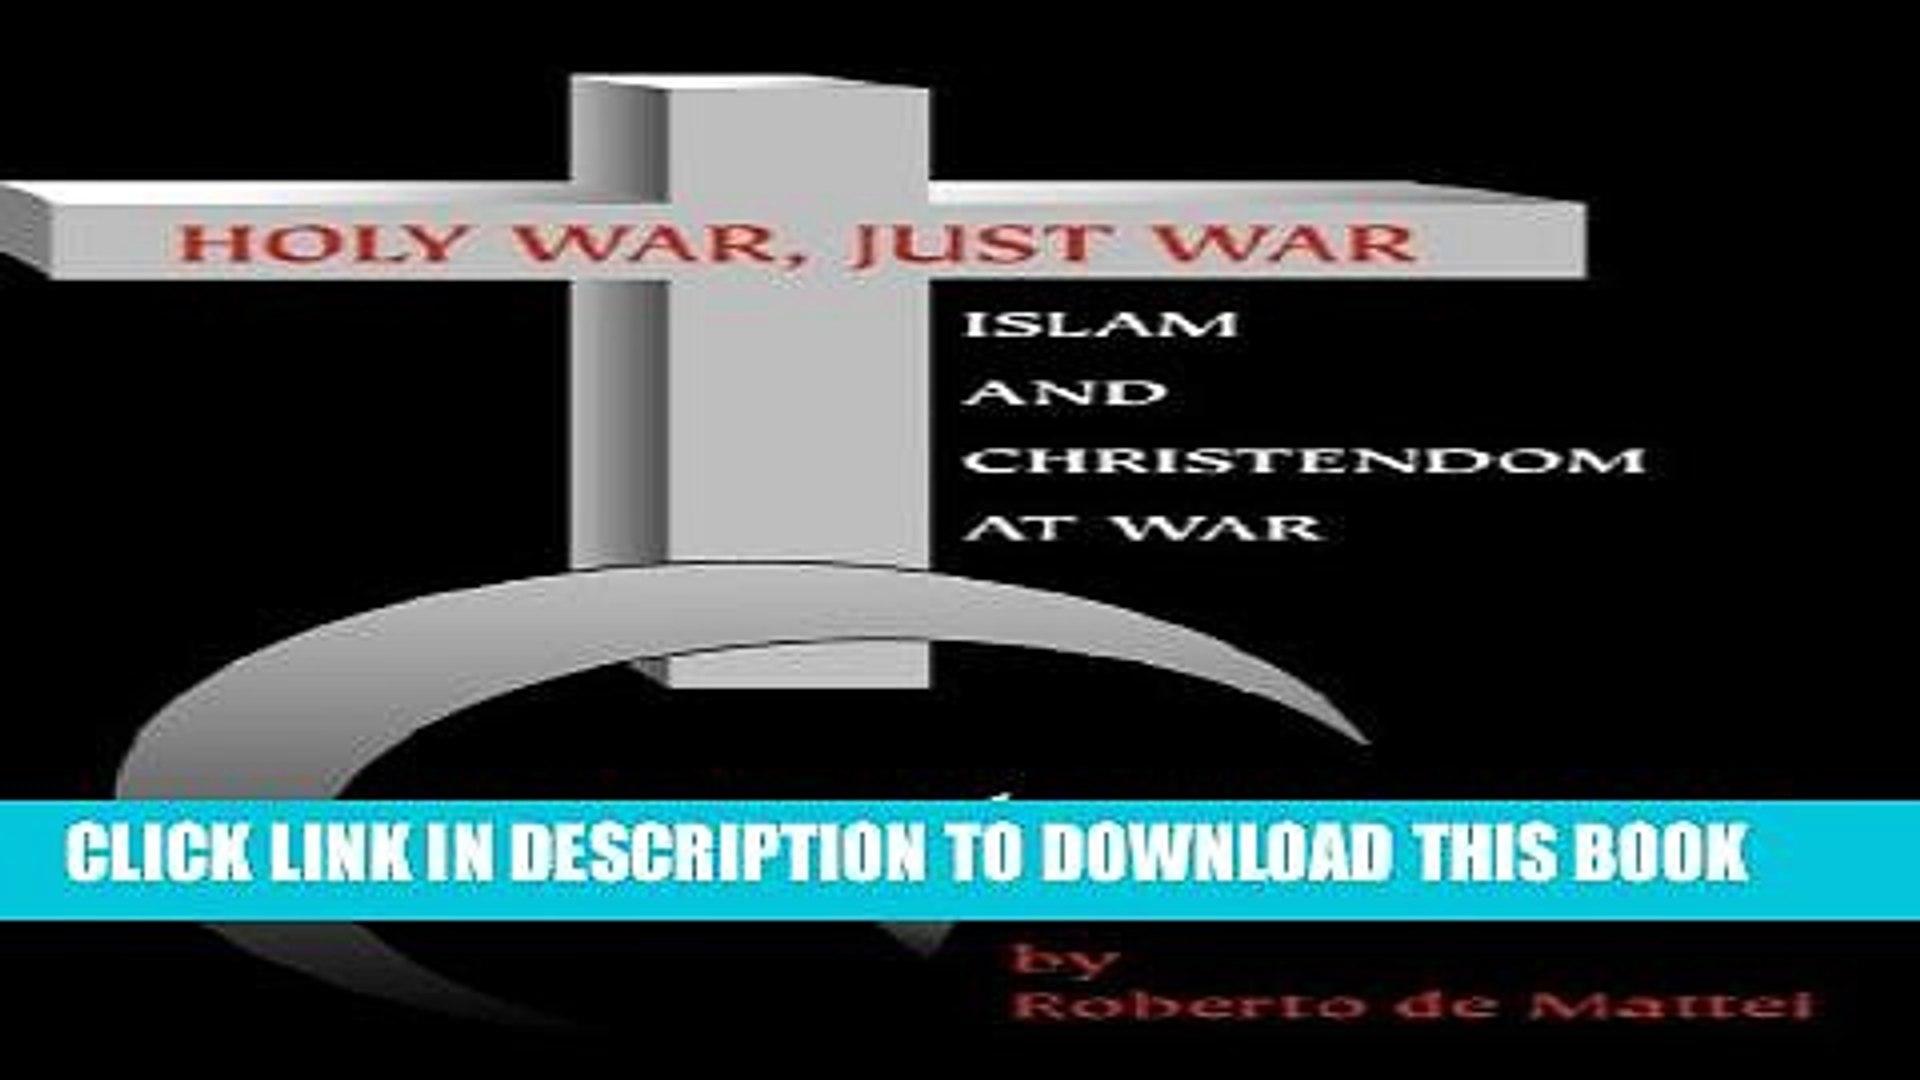 [PDF] Holy War, Just War: Islam and Christendom at War Full Online